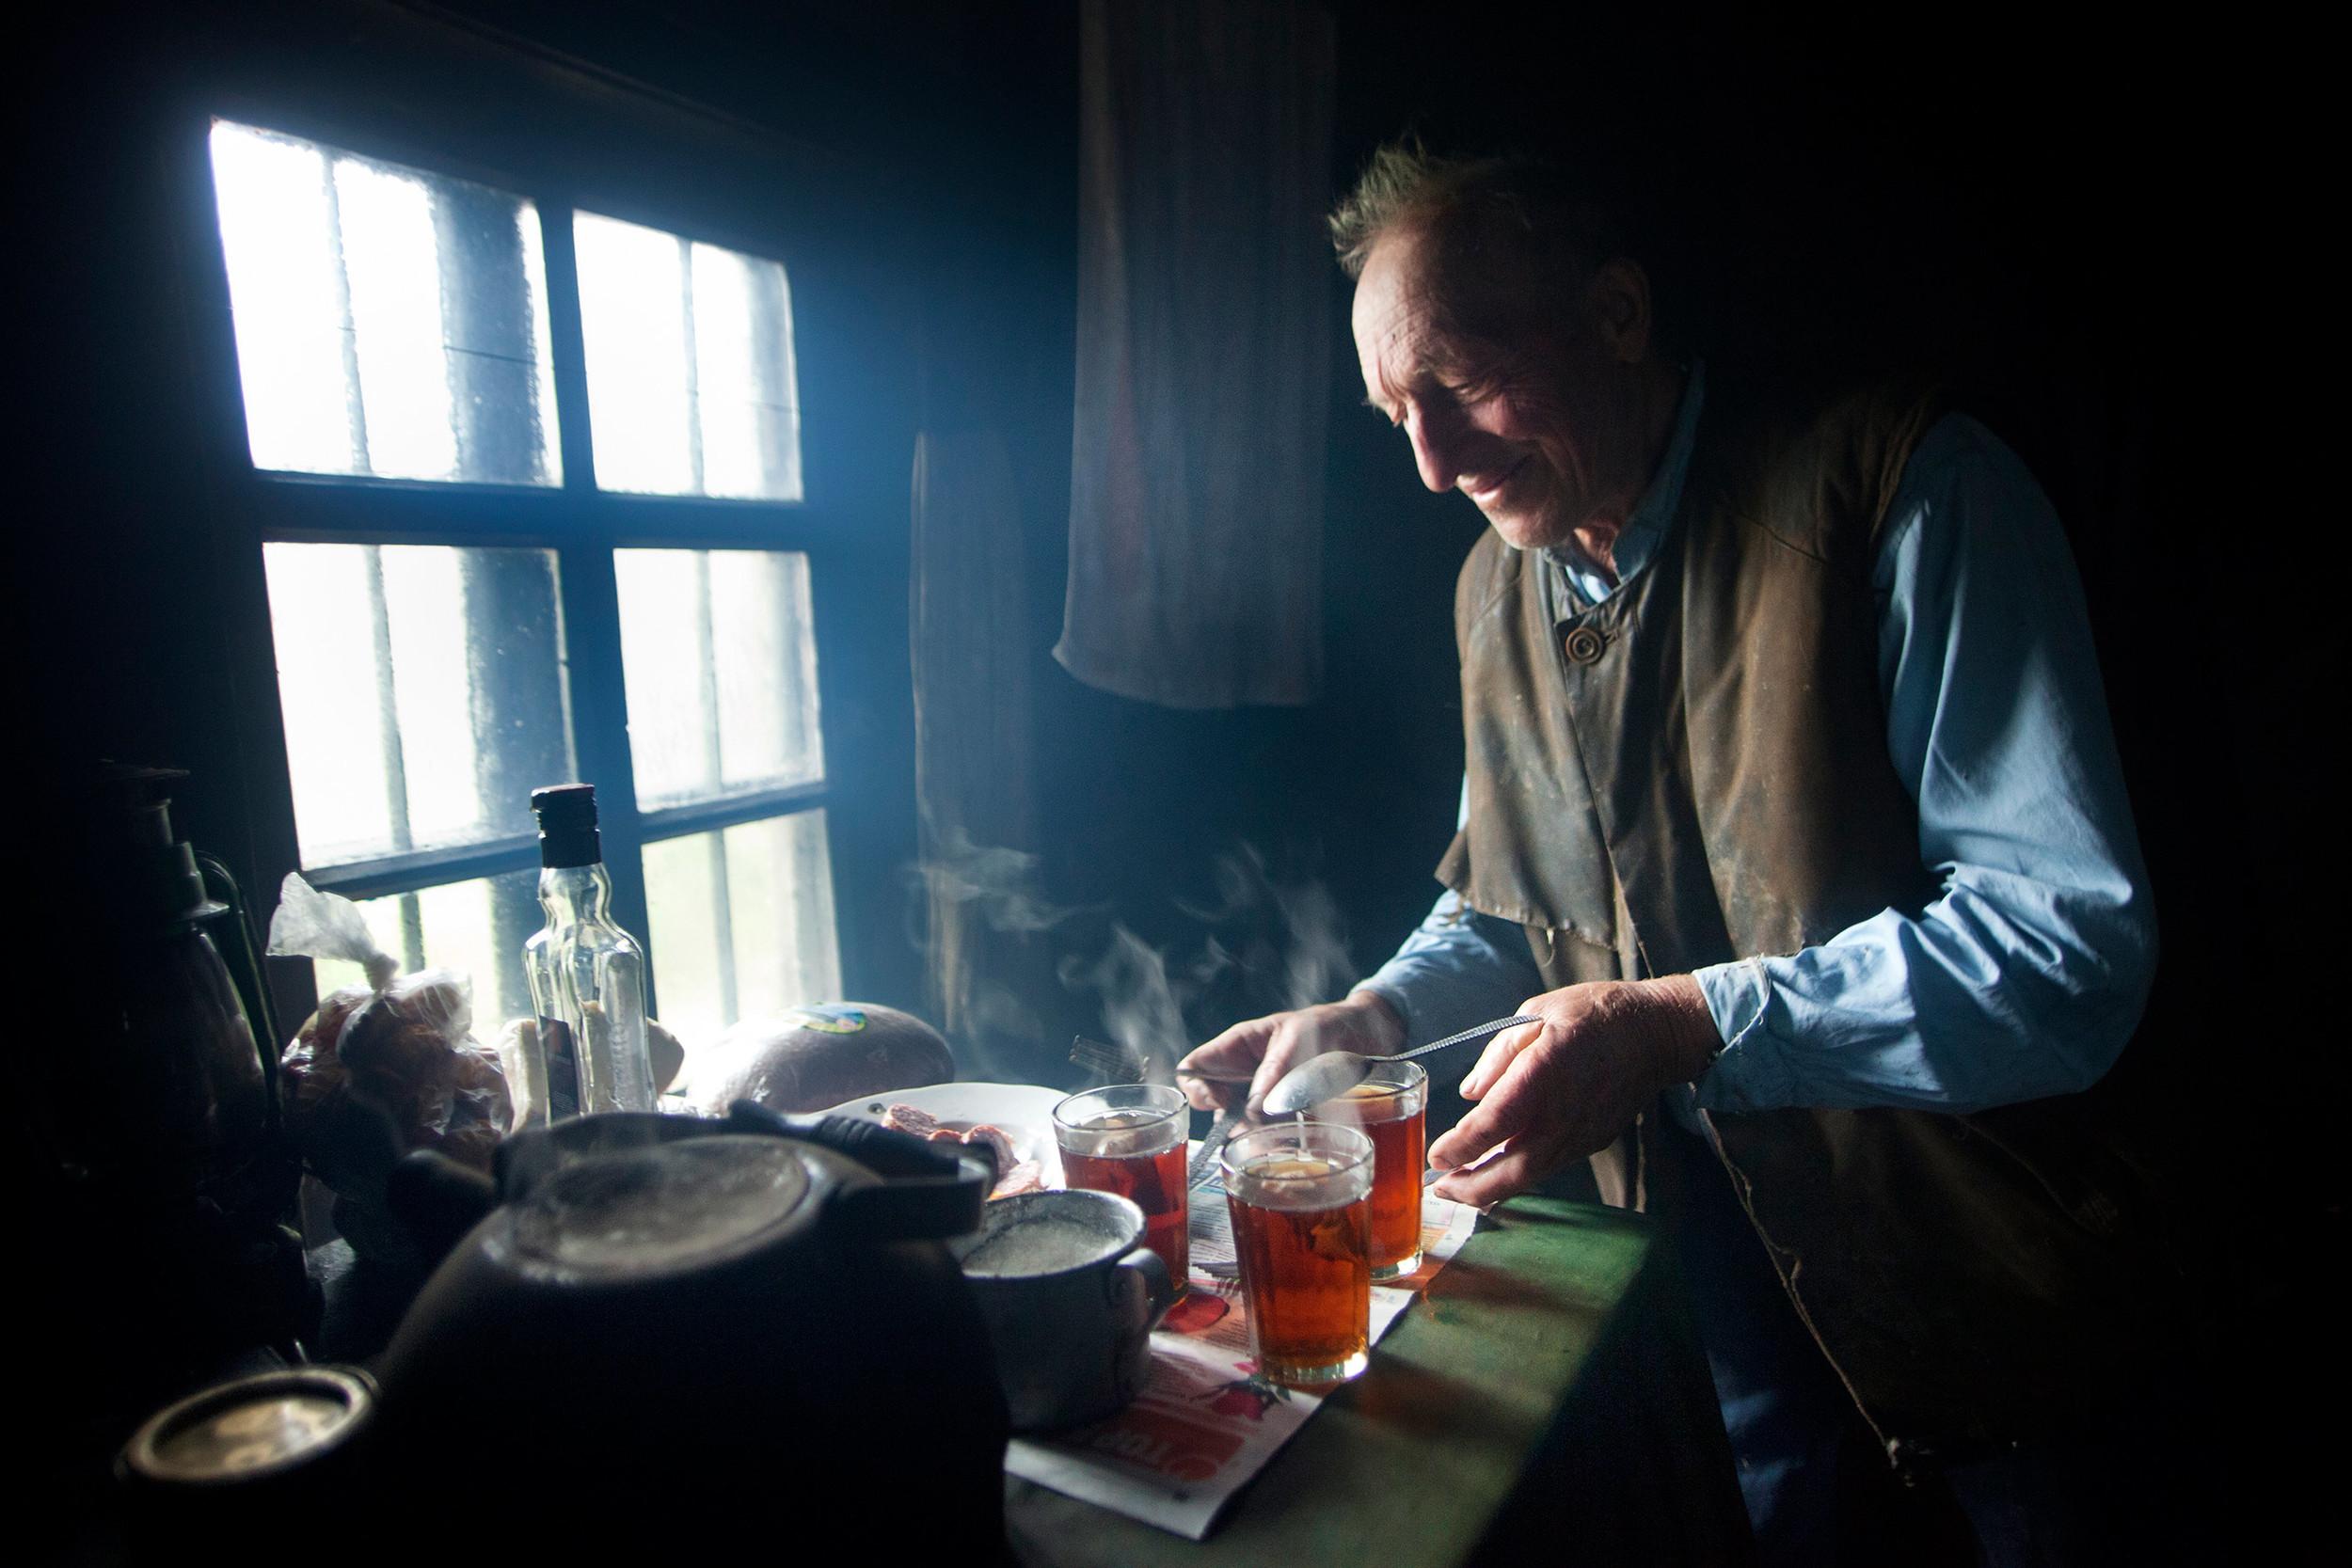 Belarusian man making tea inside his house